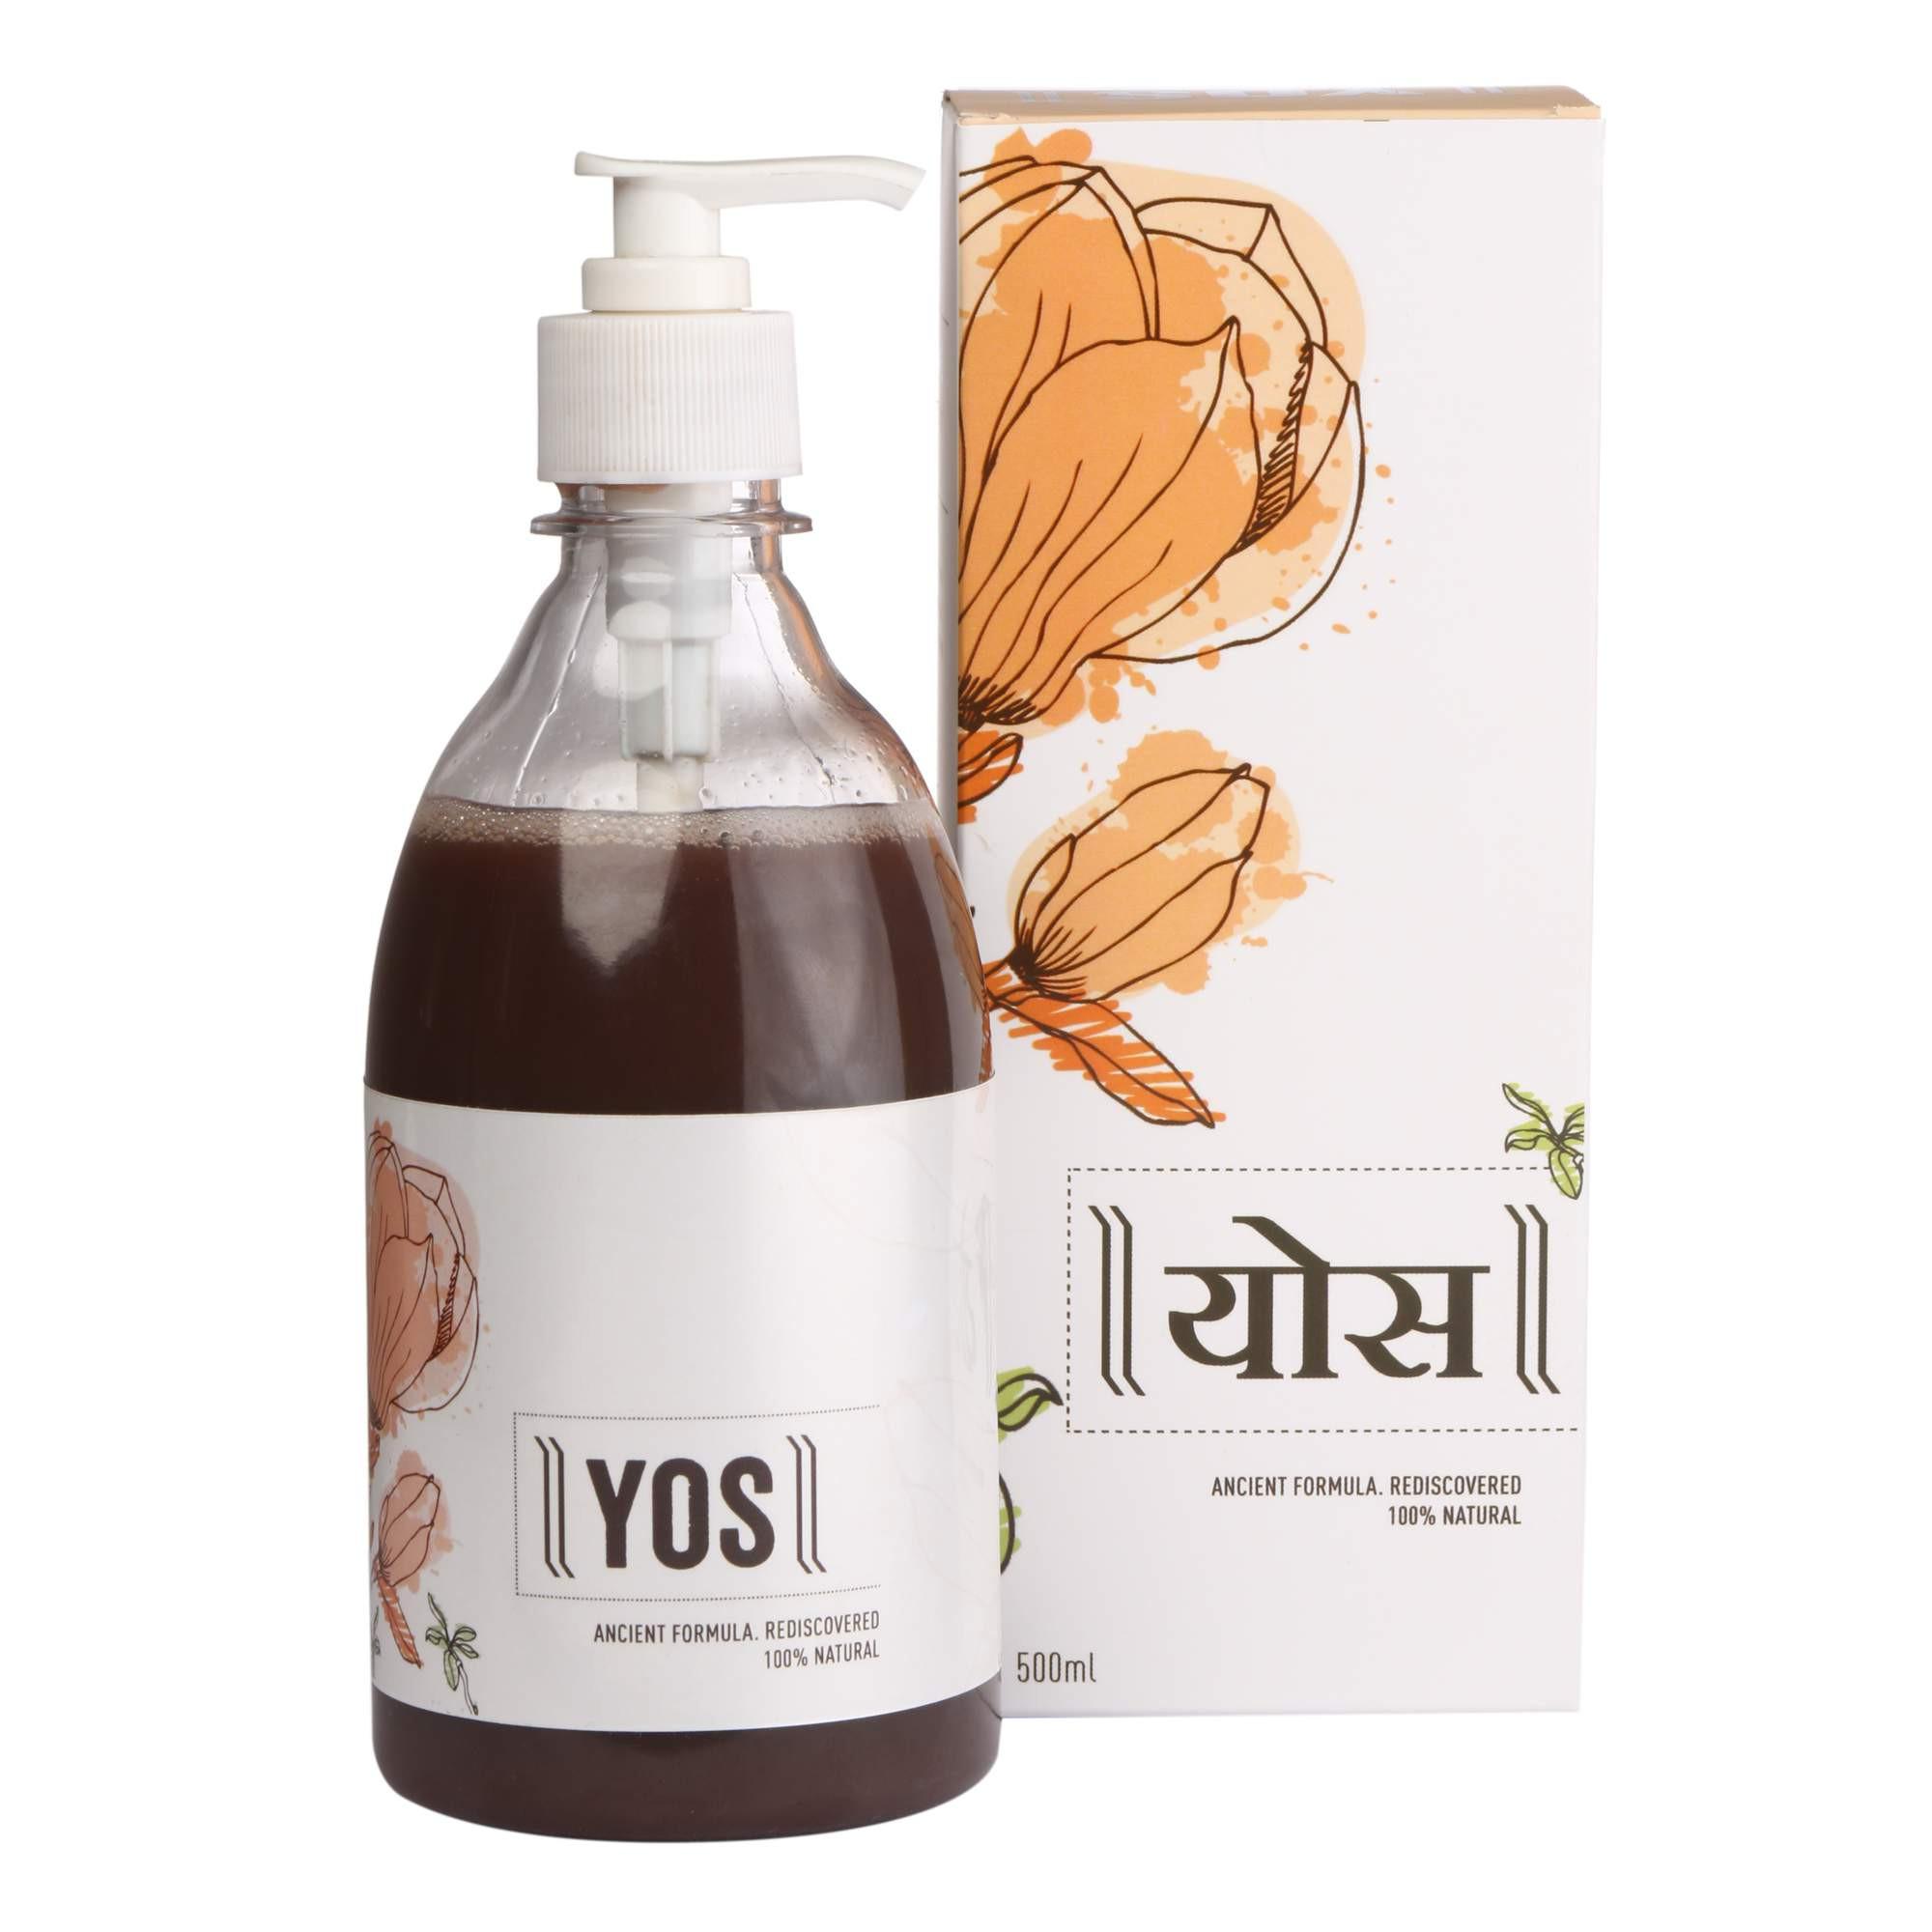 YoS - 100% Natural Organic Vagina Tightening Wash to Regain Vaginal Shape, Strength and Hygiene